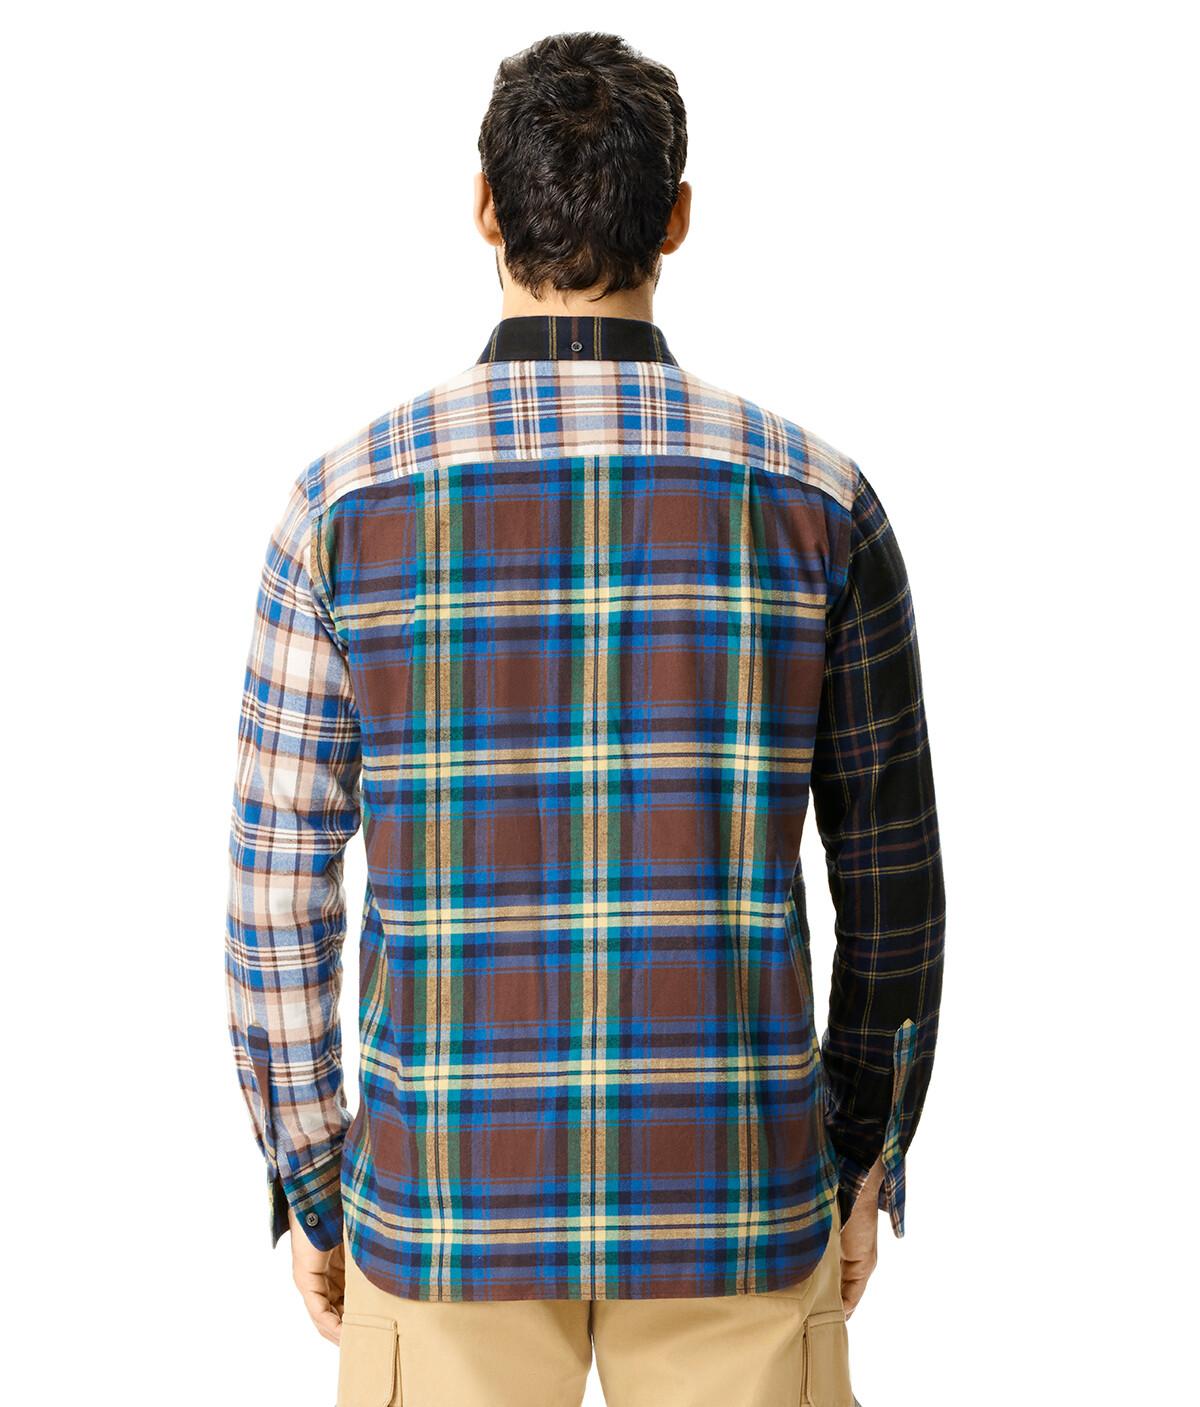 LOEWE Eln Patchwork Check Overshirt 多色拼接 front